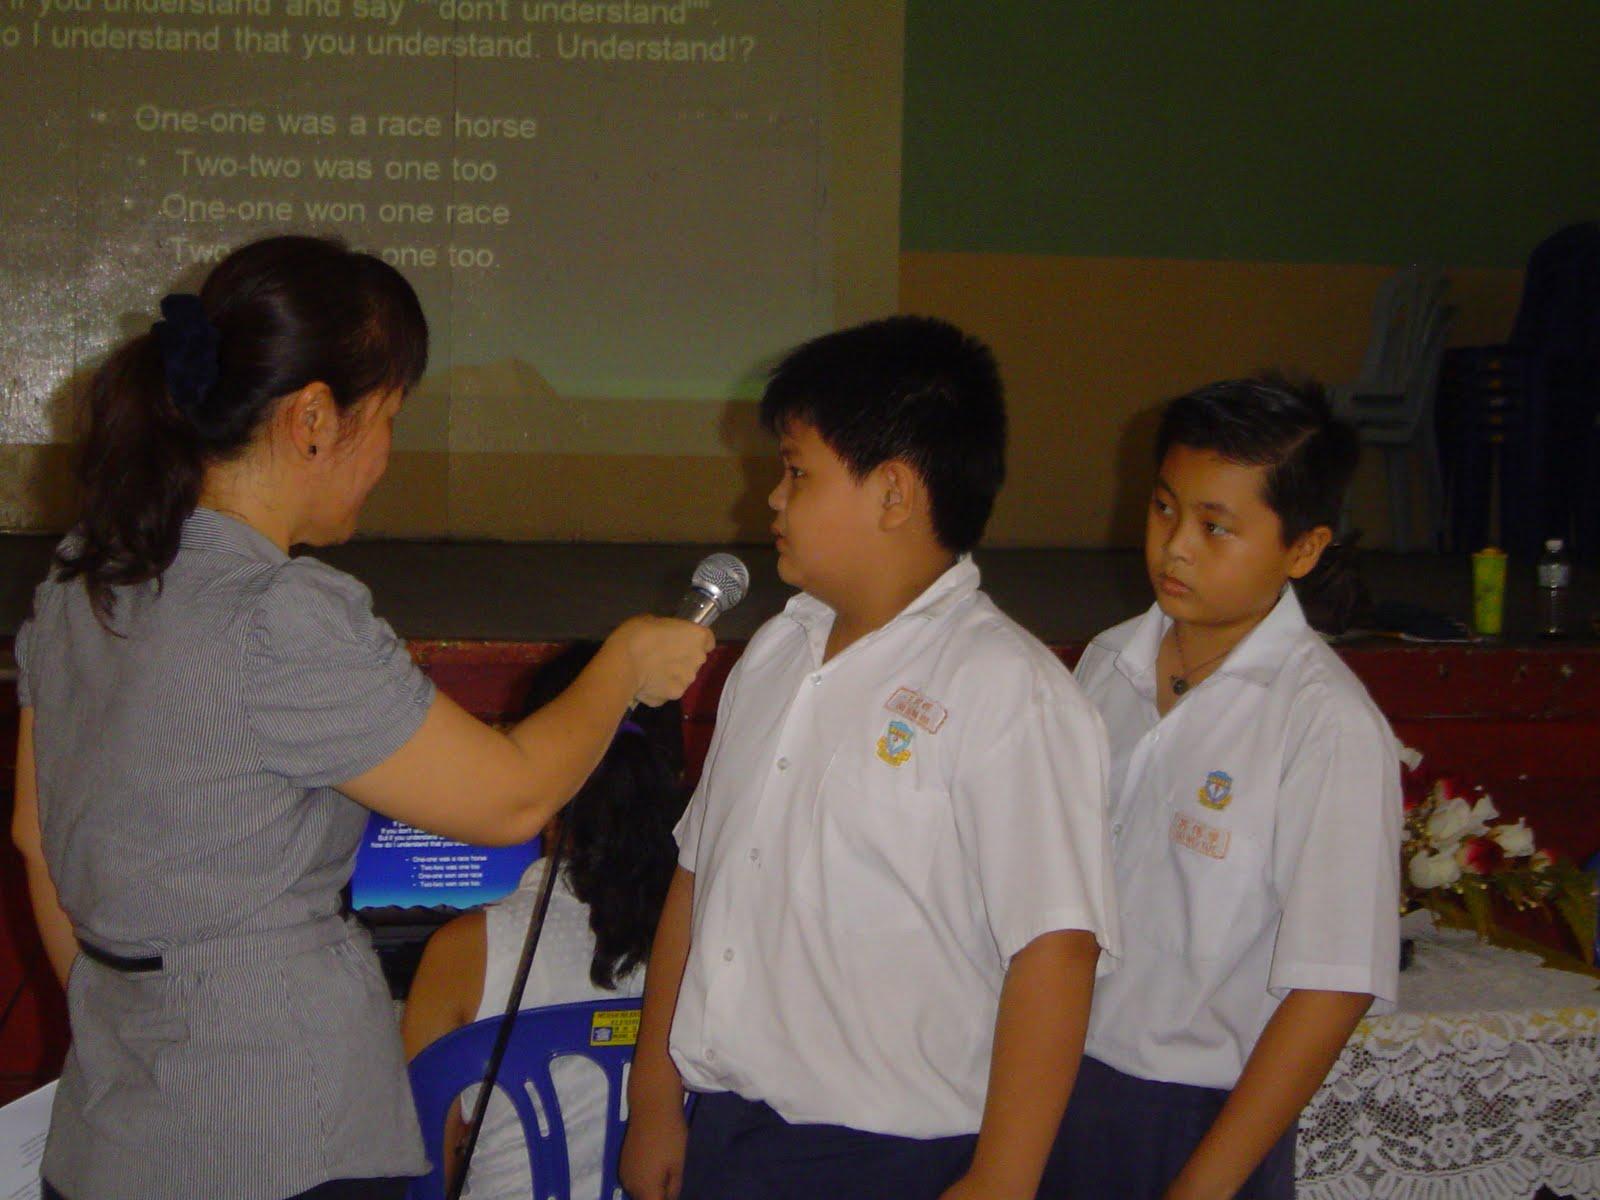 SJK(C) Choong Hua Banting 万津中华学校: May 2010